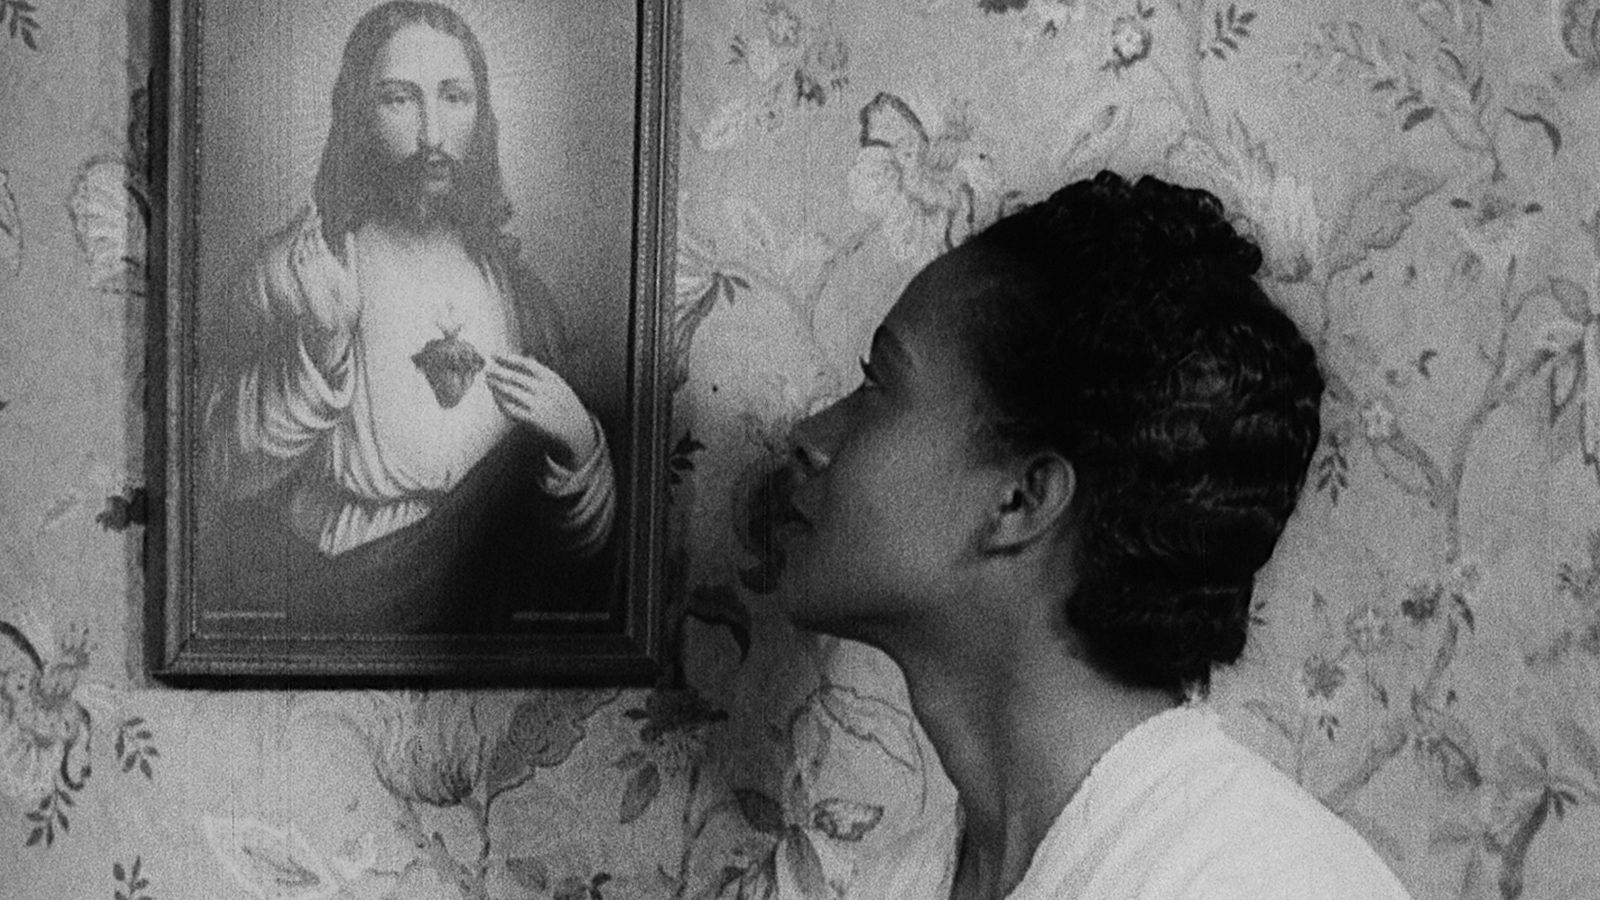 #81) The Blood of Jesus - (1941 - dir. Spencer Williams)